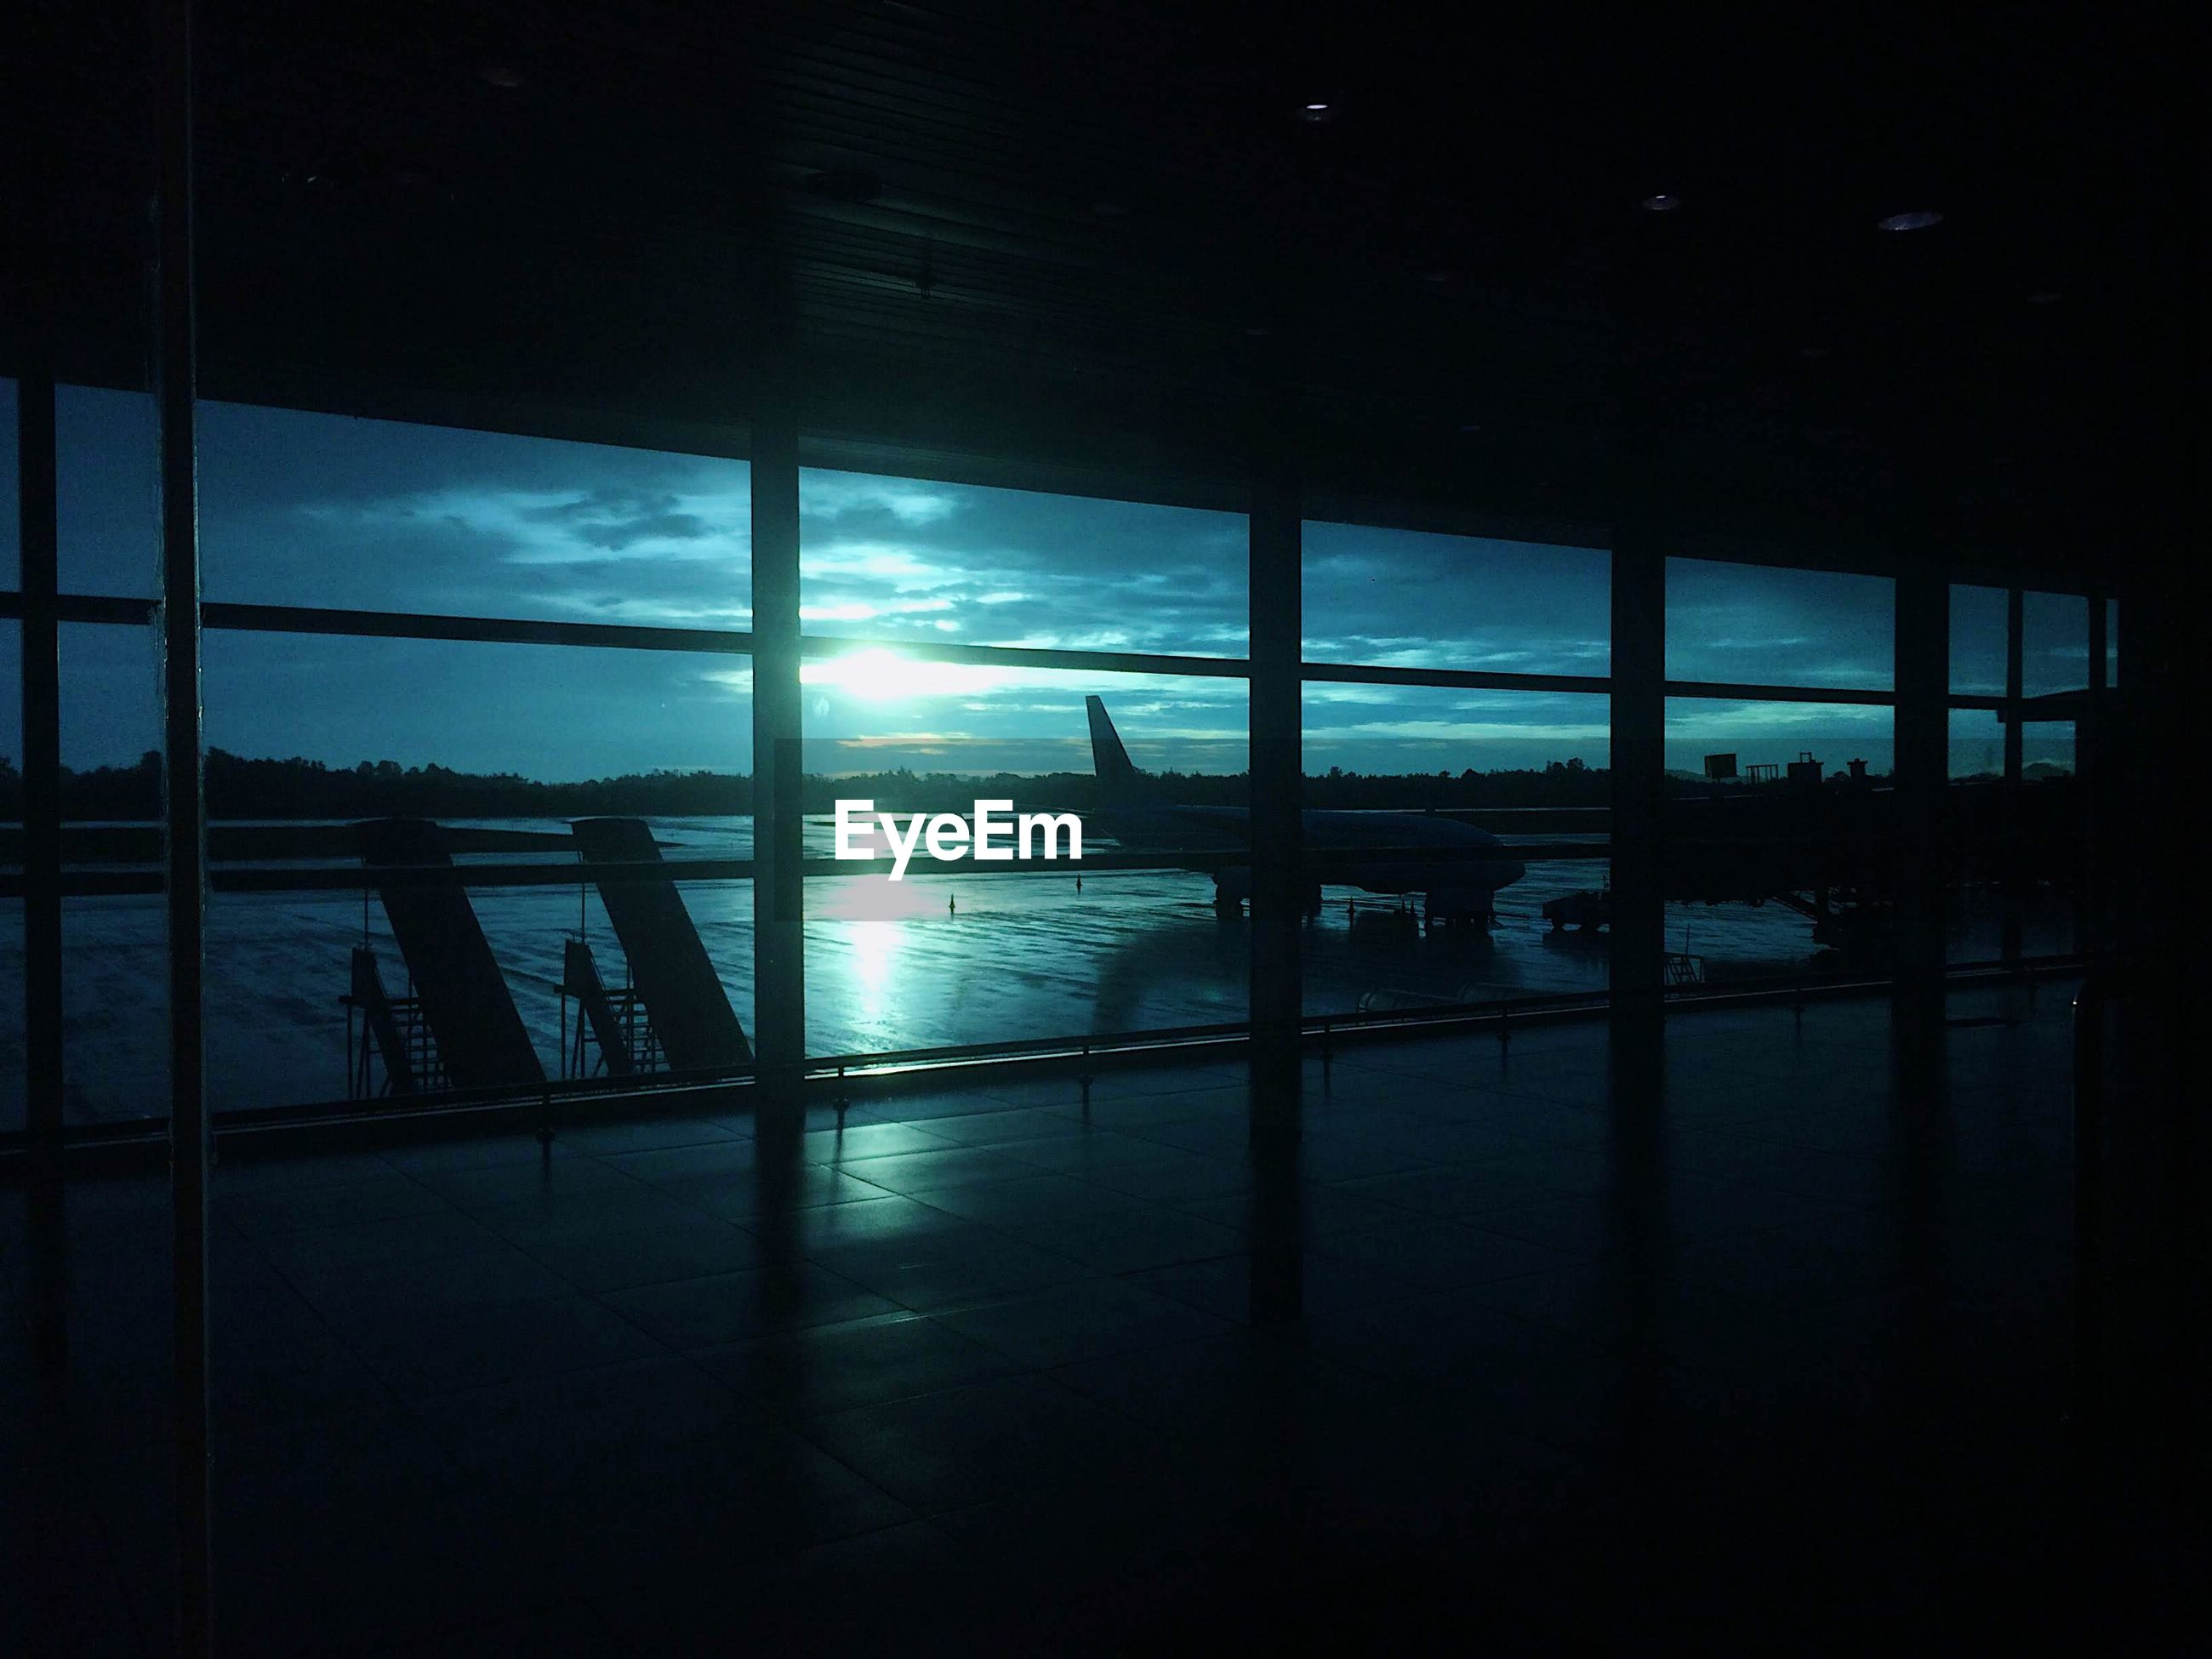 Silhouette airplane against sky seen through glass window